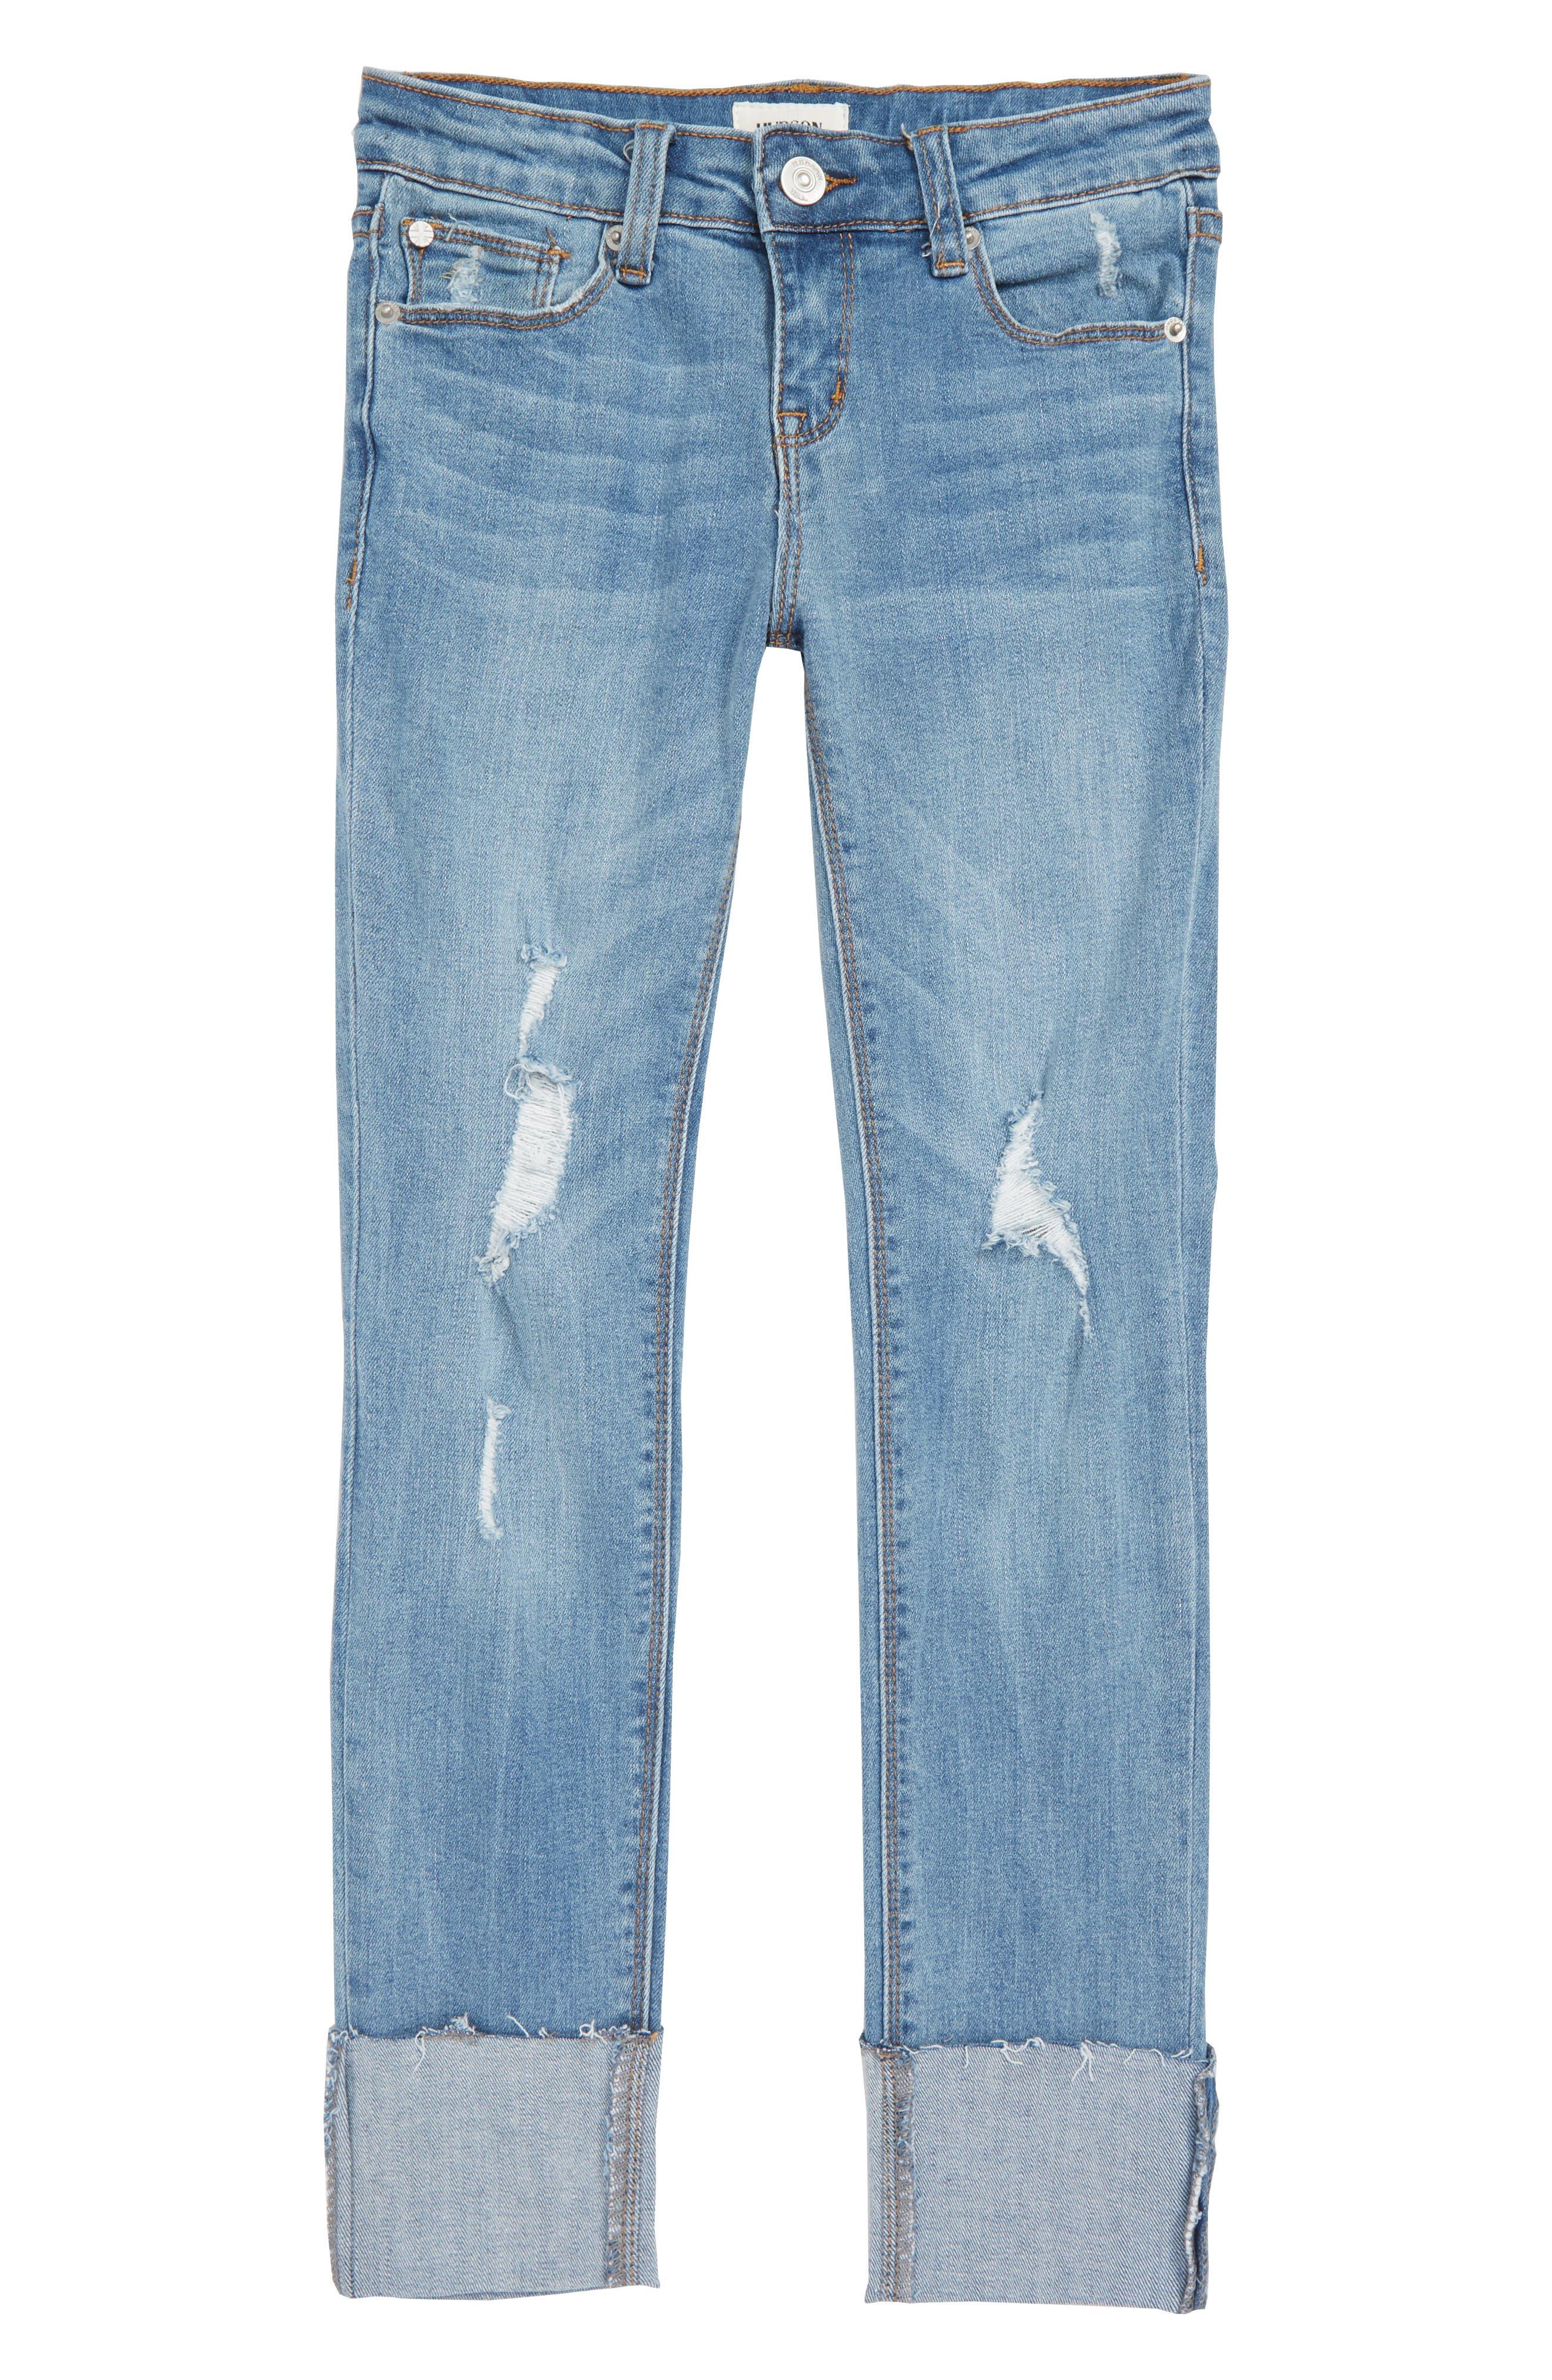 Kaia Convertible Skinny Jeans, Main, color, COASTAL BLUE WASH